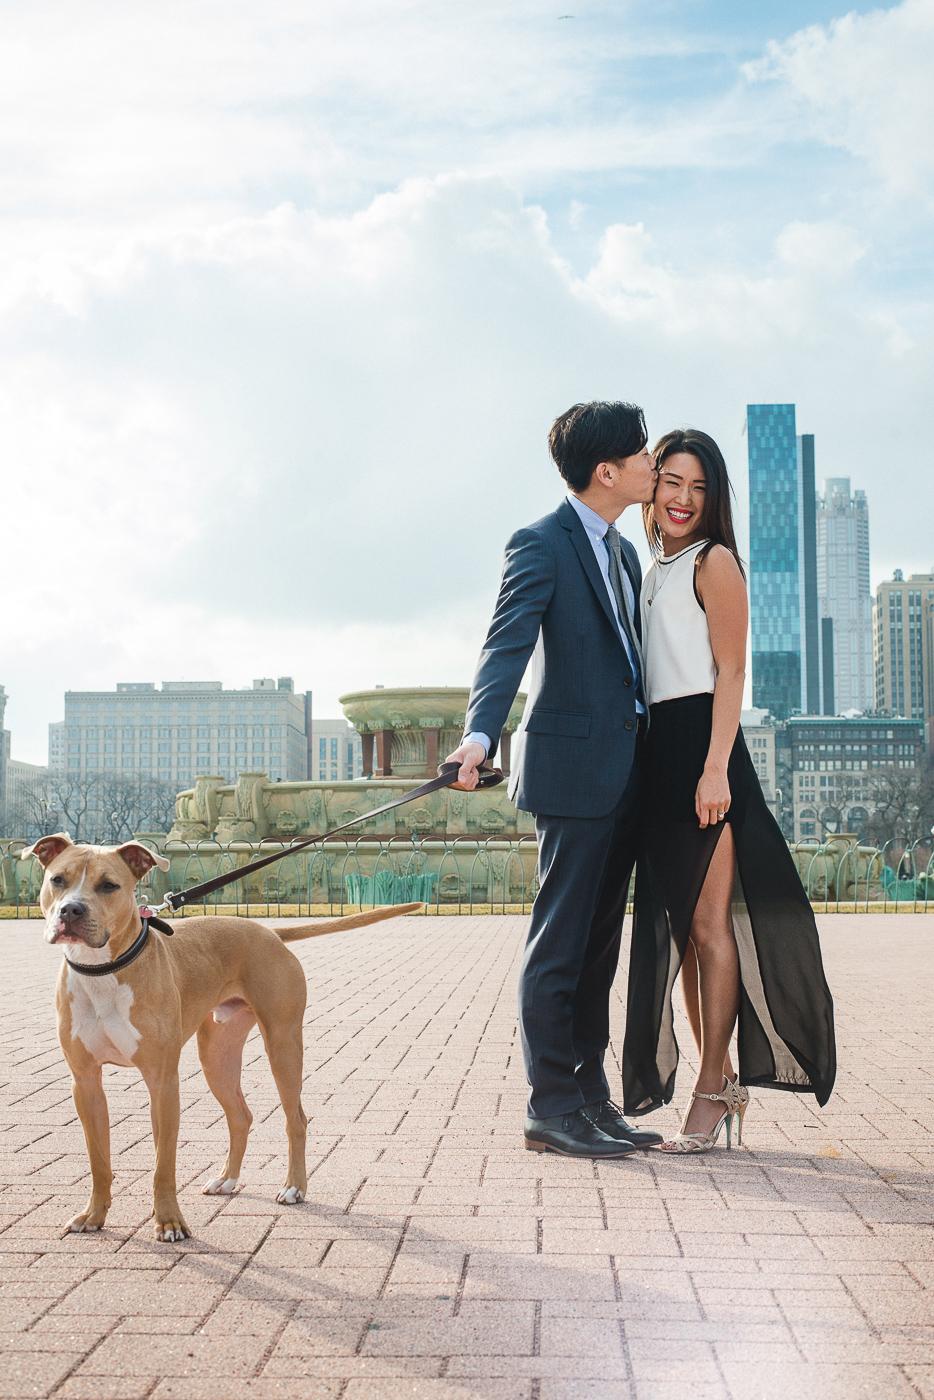 Zoe_Rain_Chicago_Engagement_Shoot_Wedding_Photography_Couple_-5.jpg